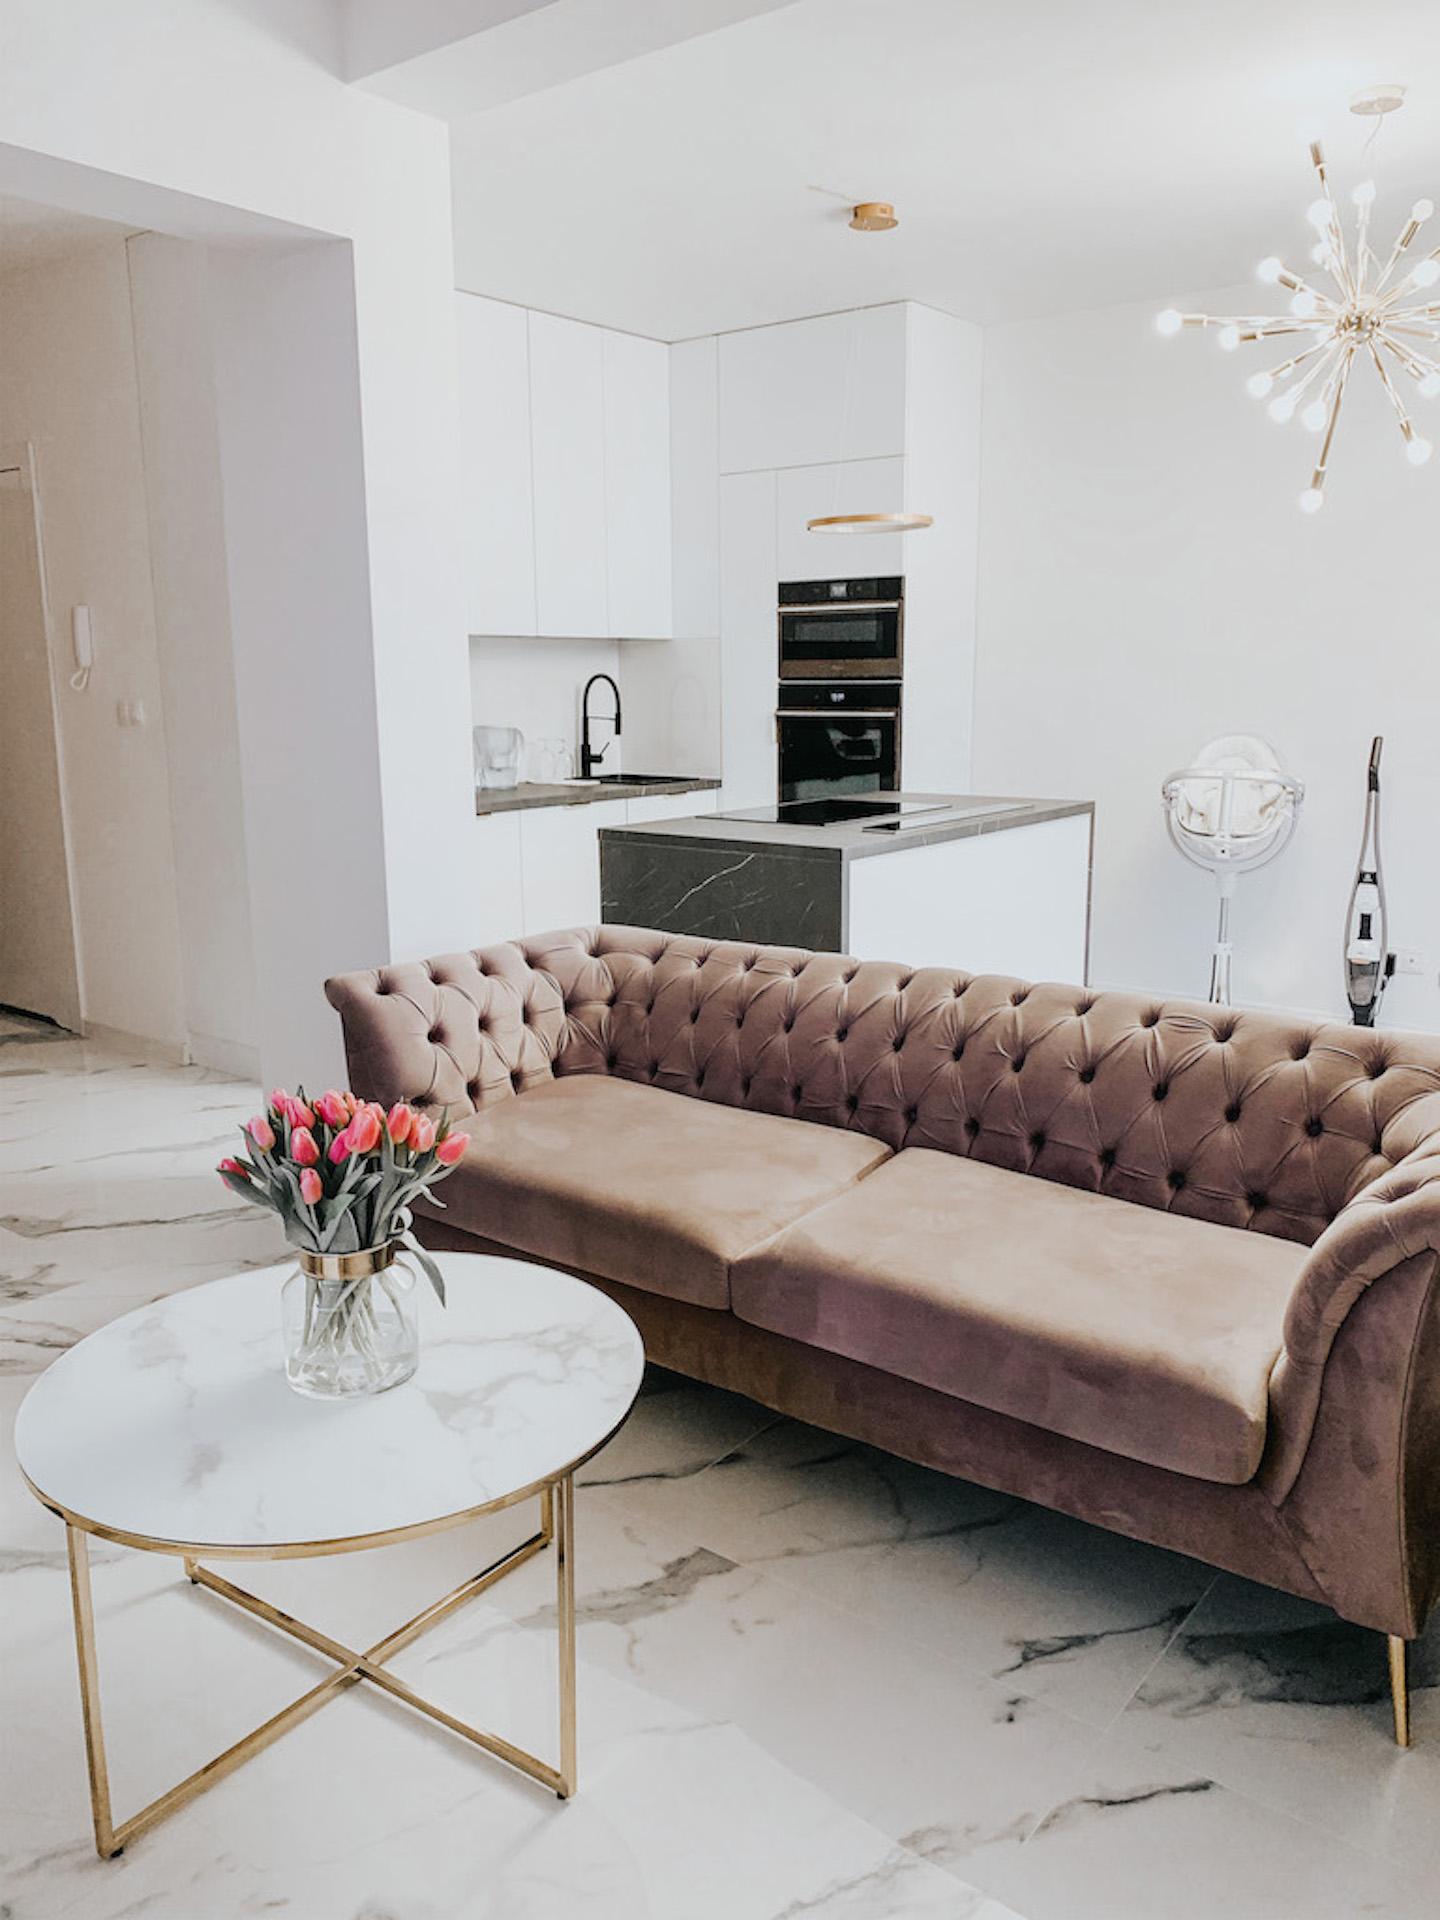 Chesterfield Modern Sofa from @dominikaaa.s